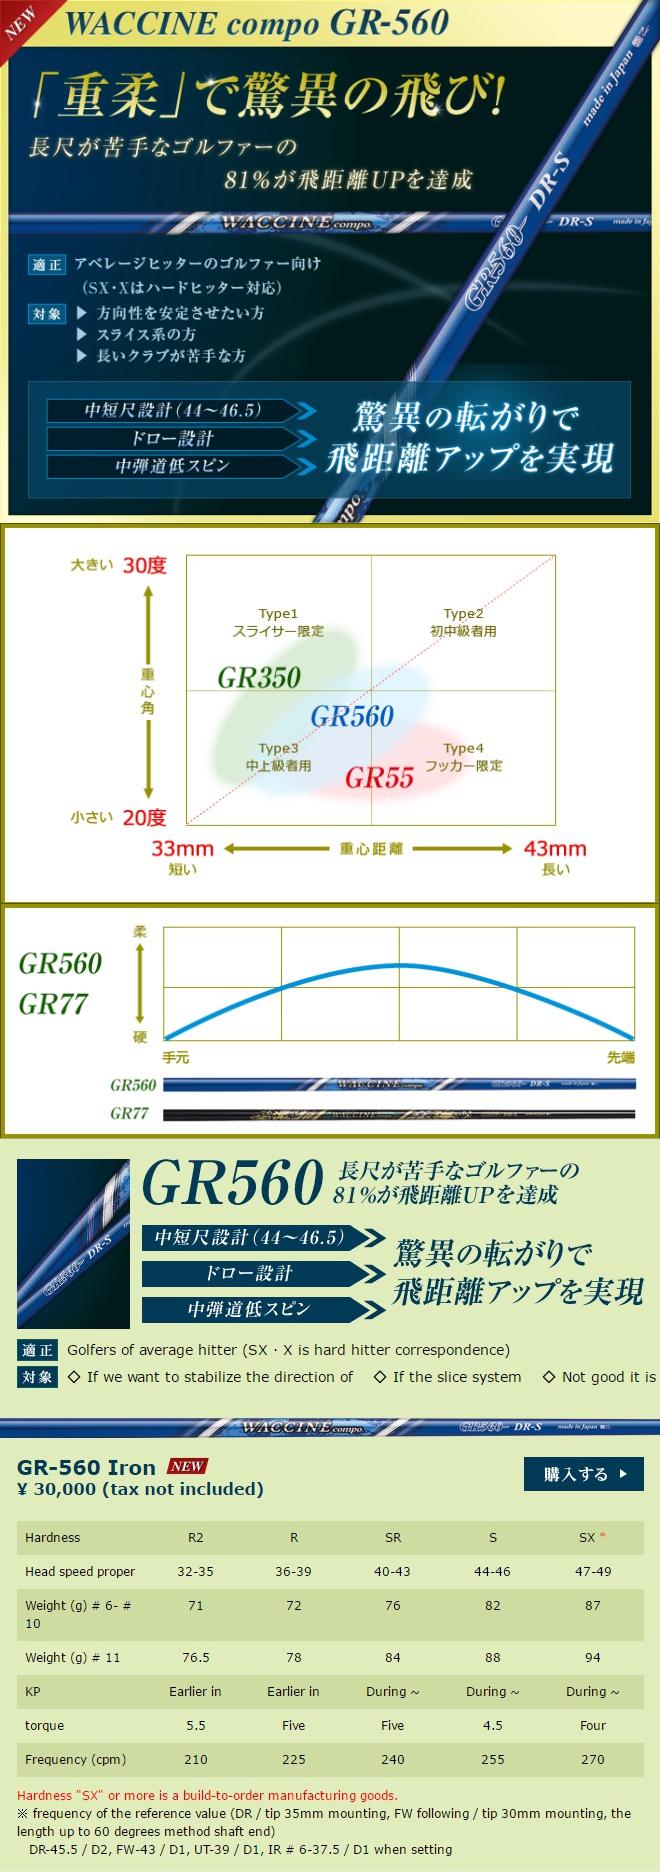 Waccine Compo GR-560 Iron